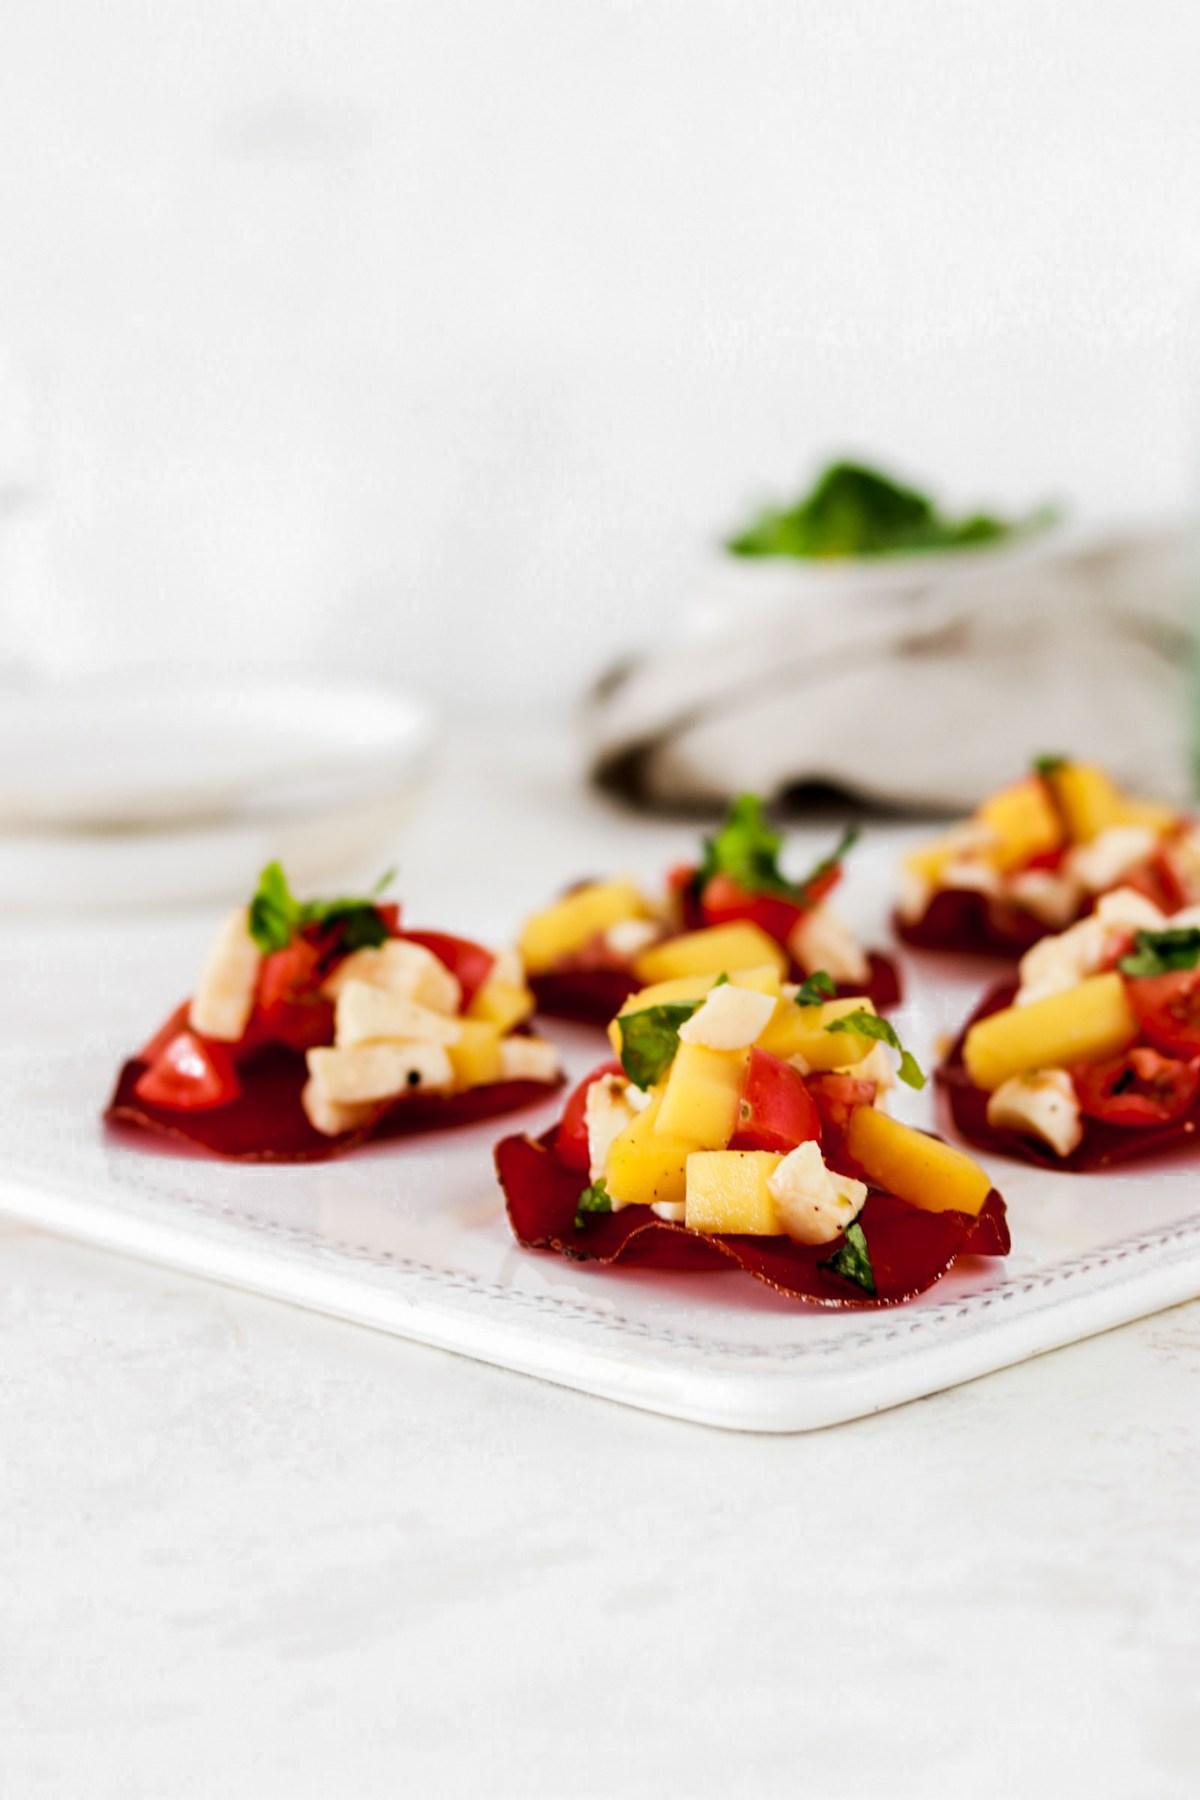 Bresaola Chips with Tomato, Mozzarella & Mango Salsa From Front